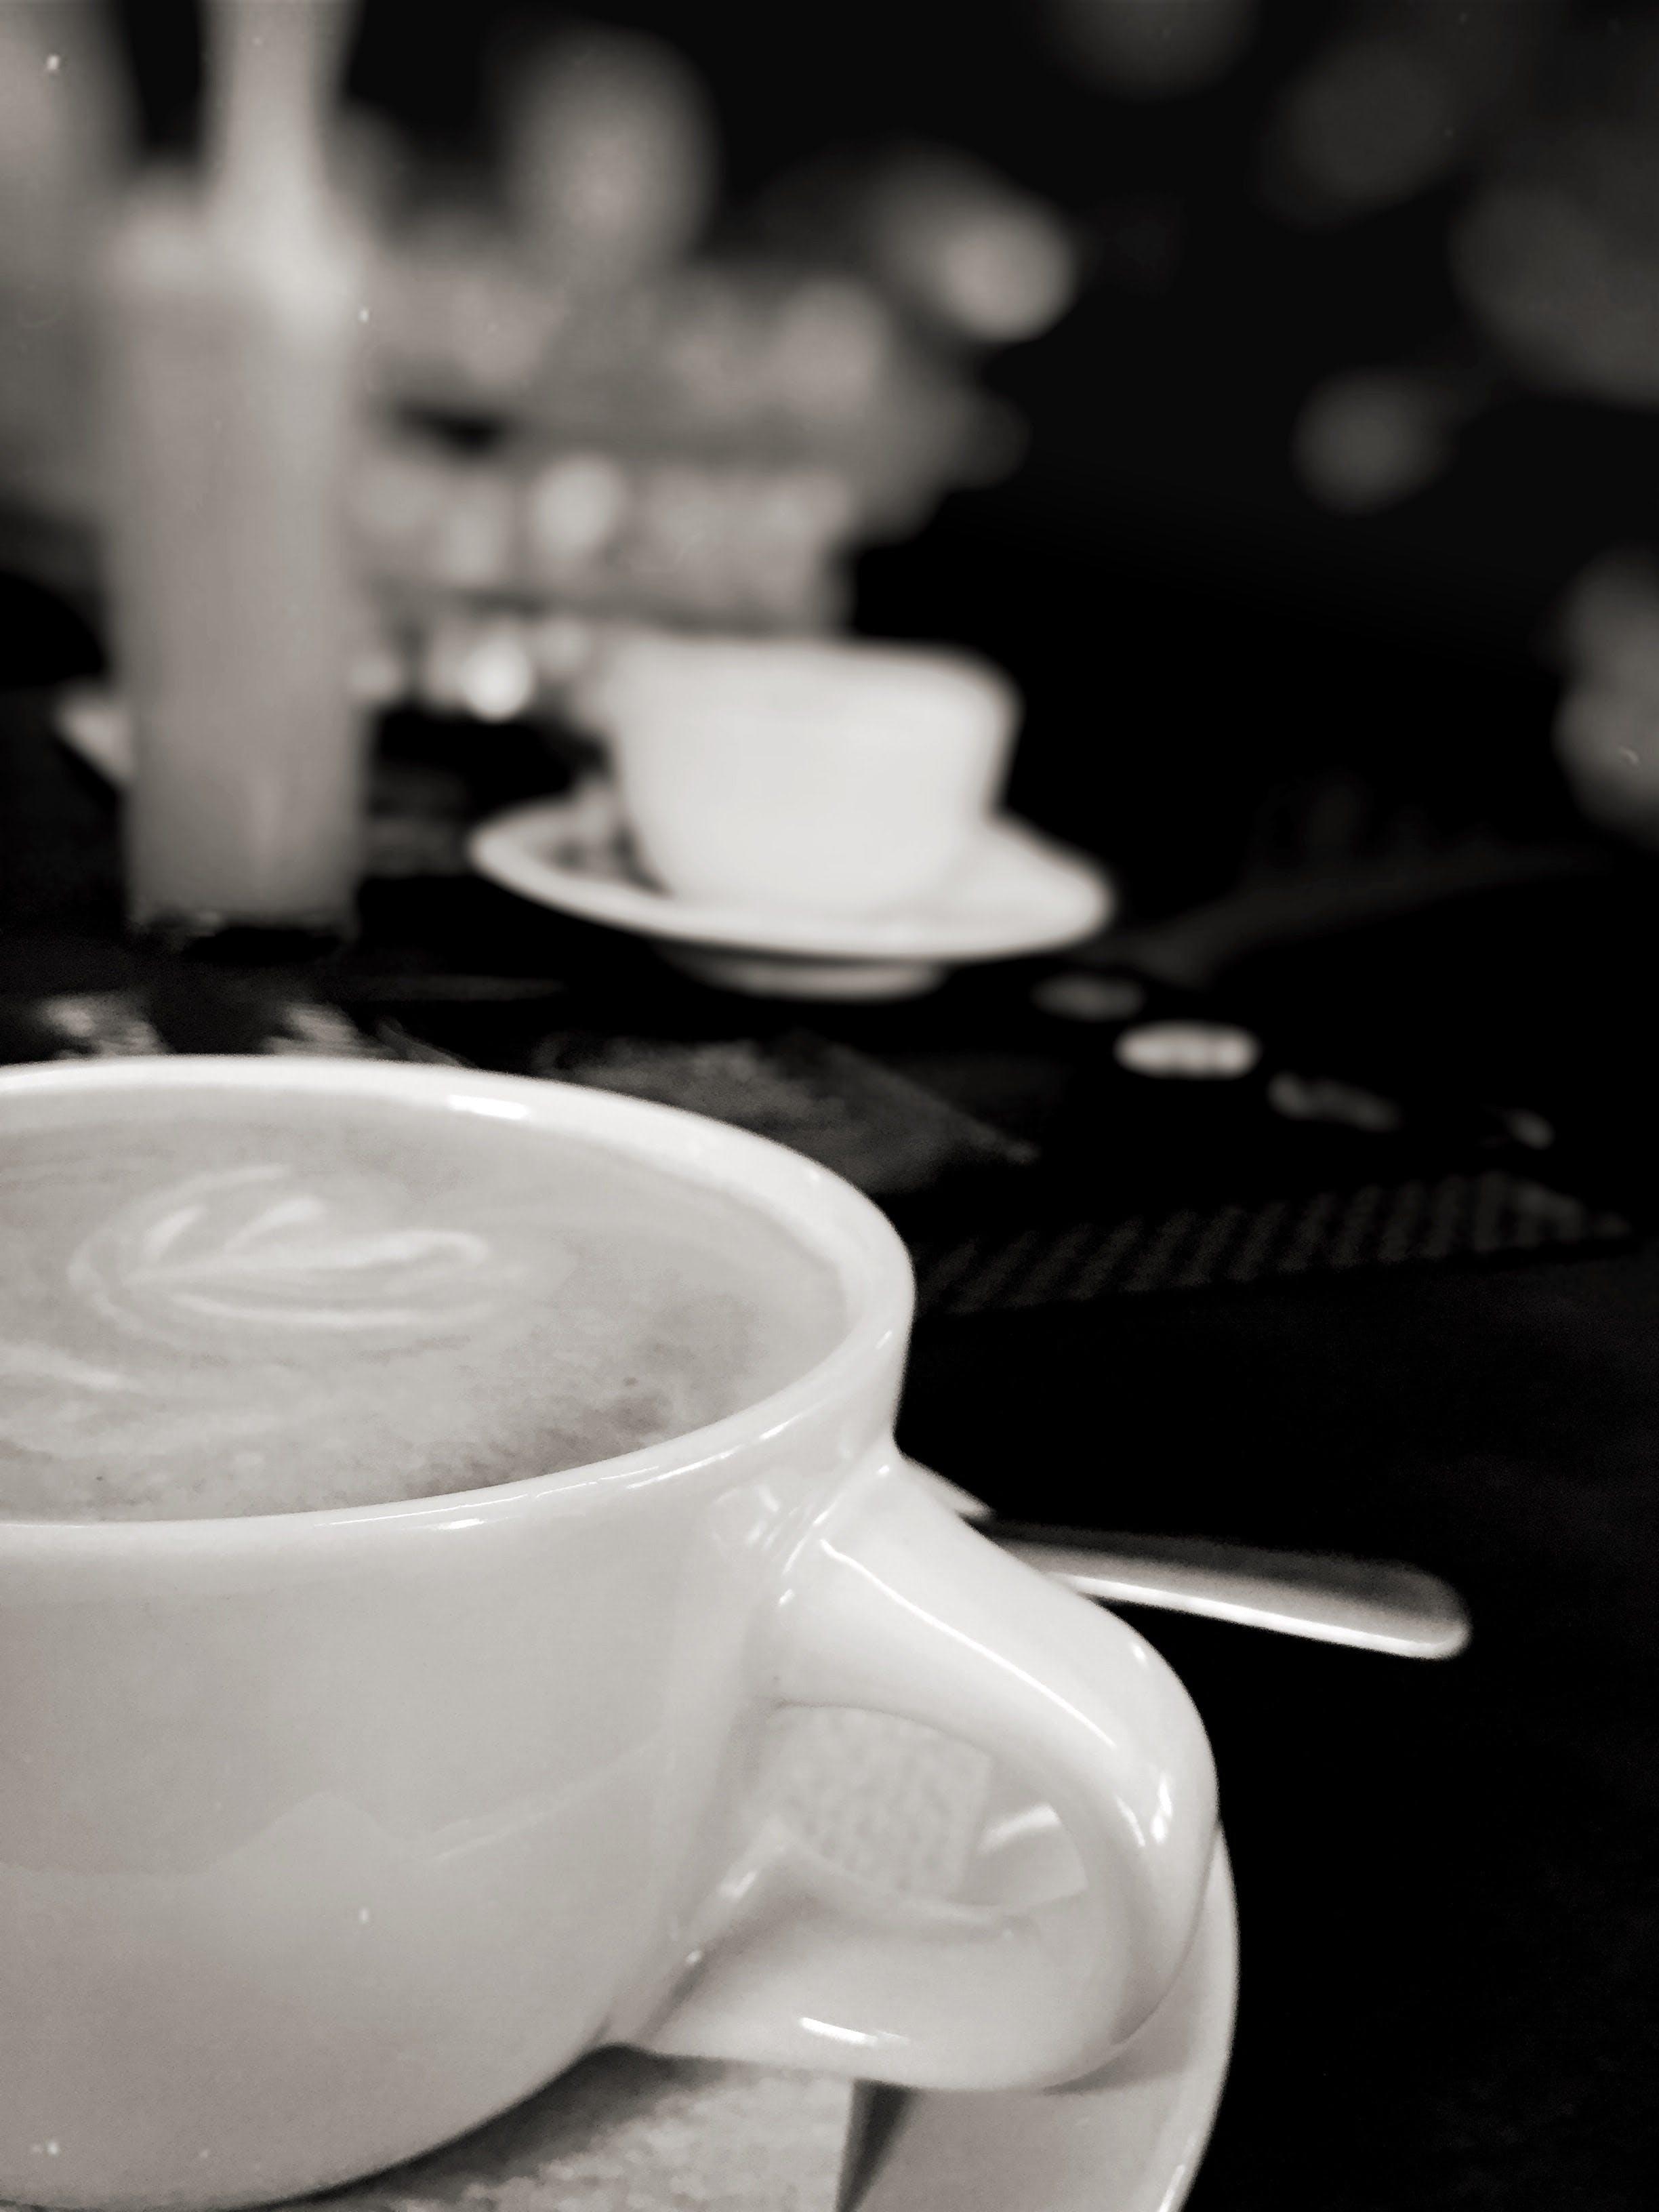 Free stock photo of black and white, café, coffee, espresso